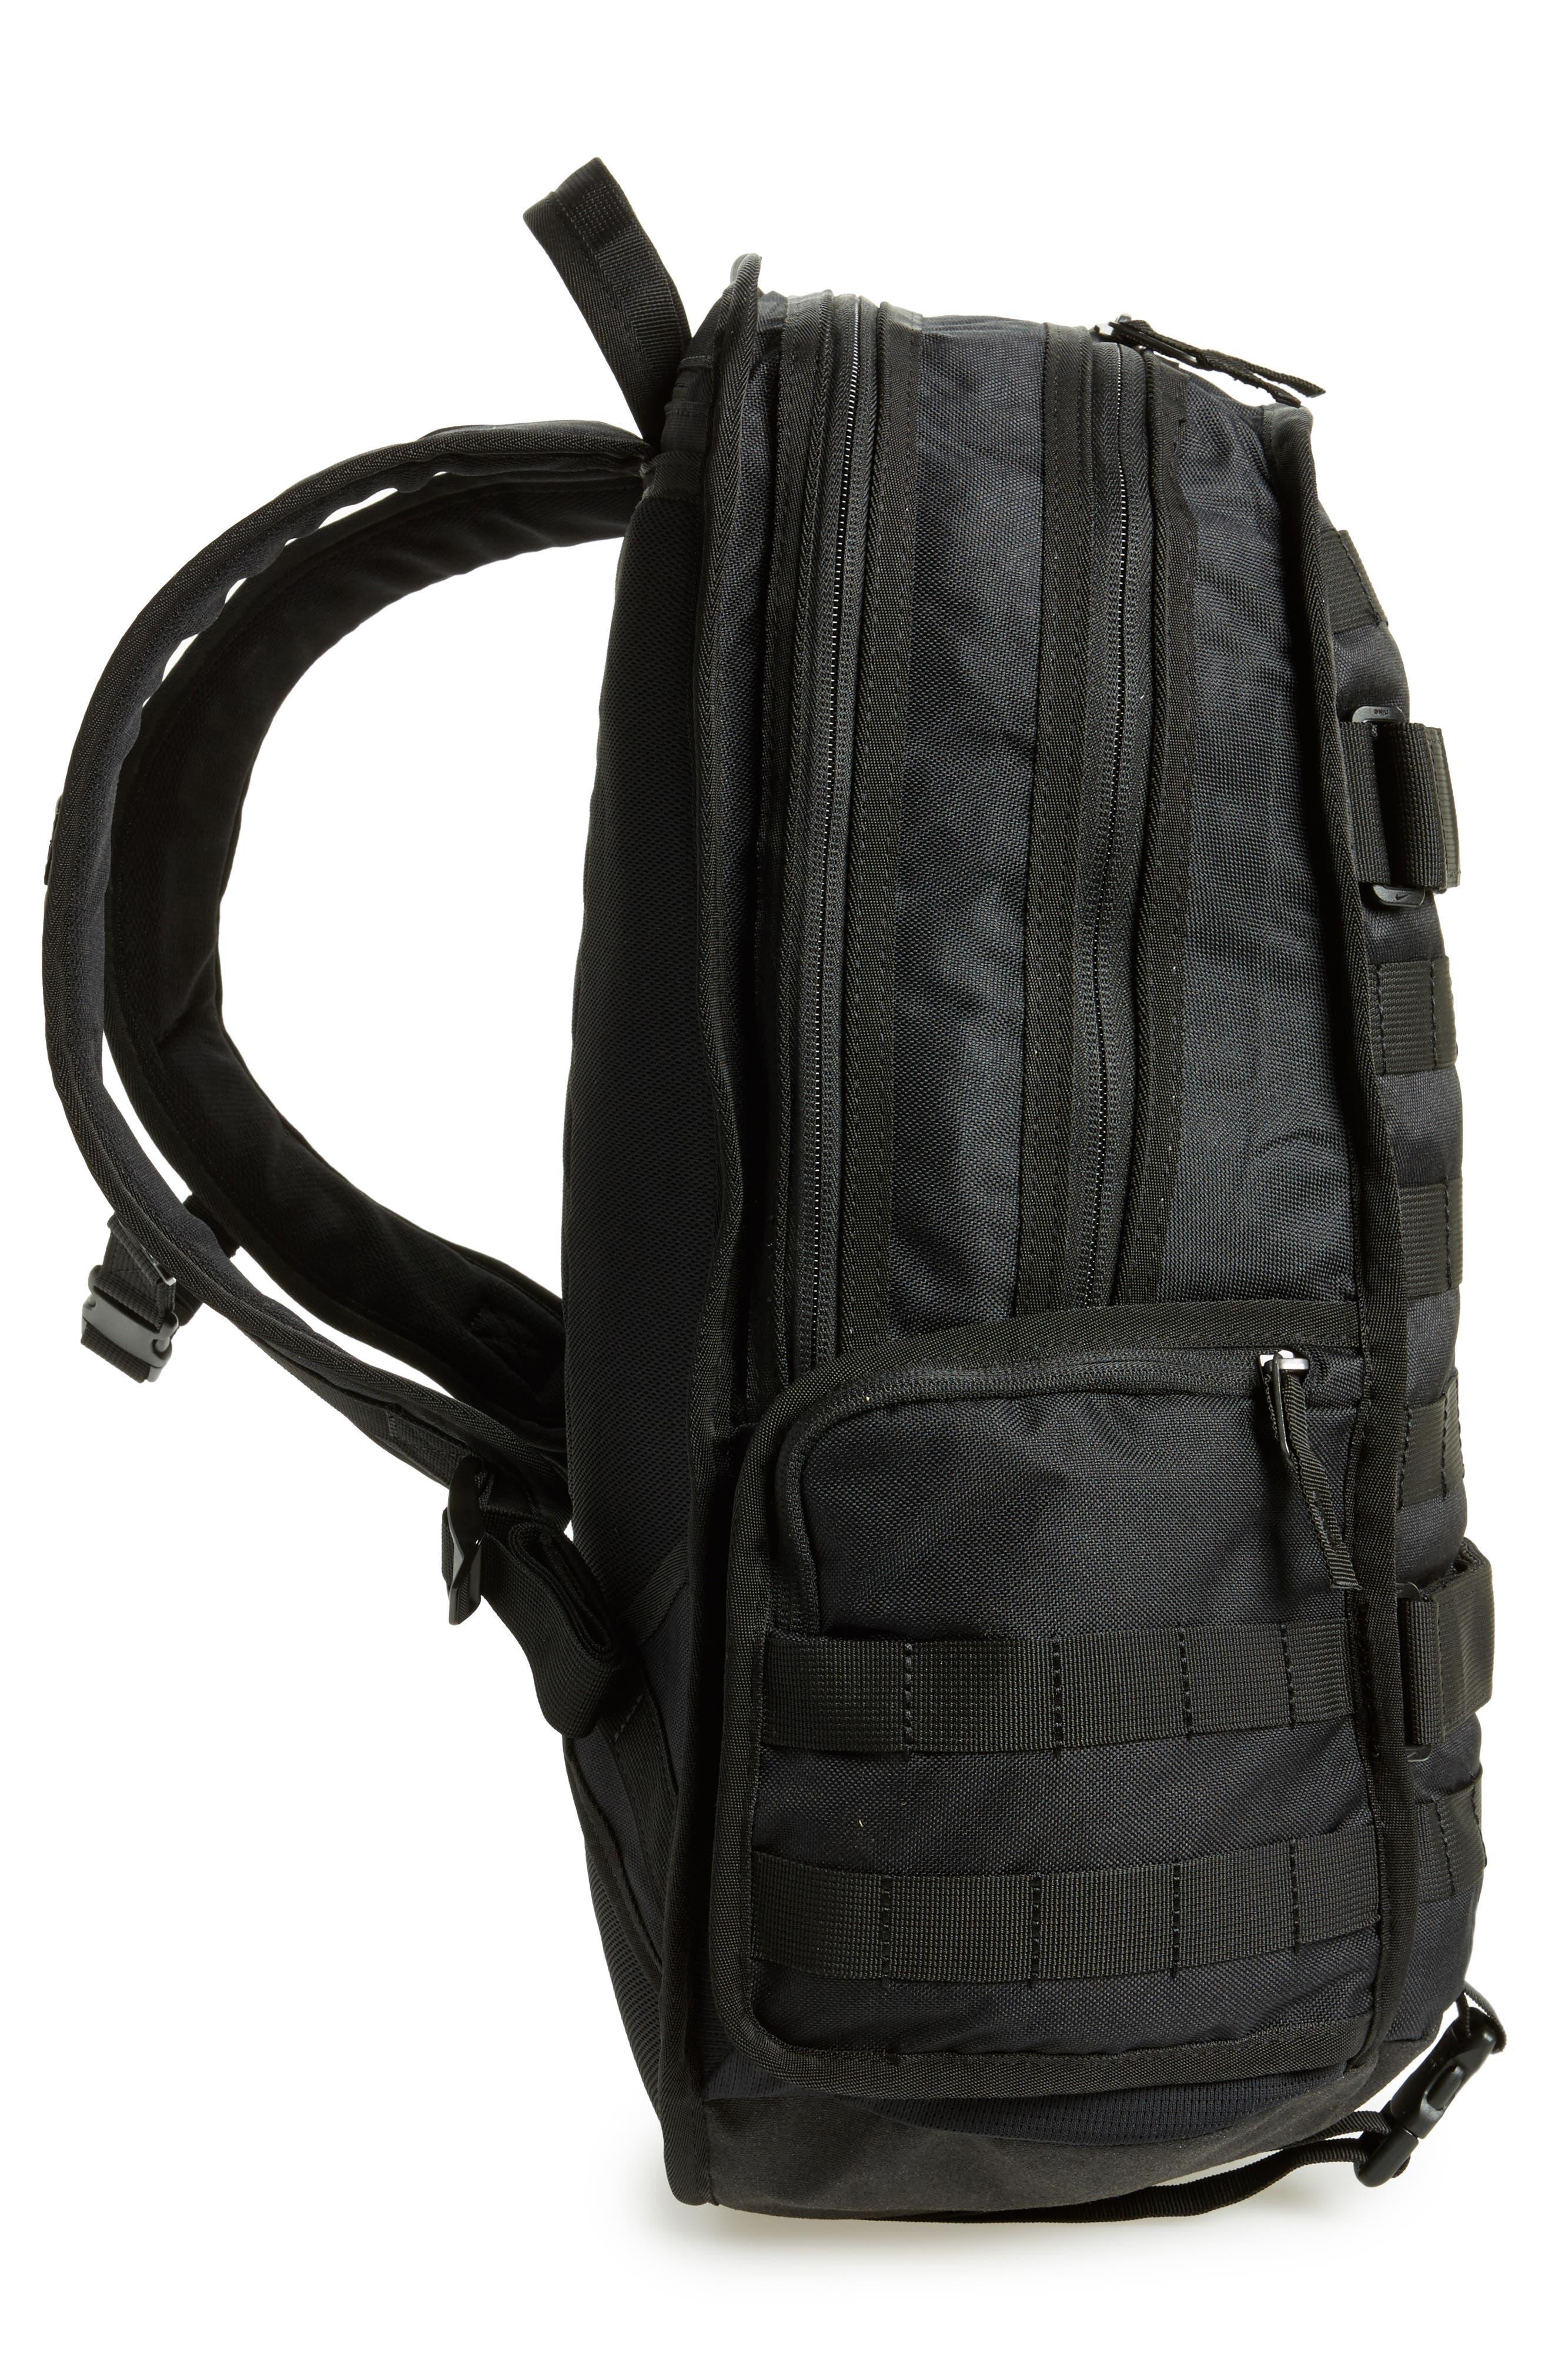 RPM Backpack,                             Alternate thumbnail 5, color,                             BLACK/ BLACK/ BLACK